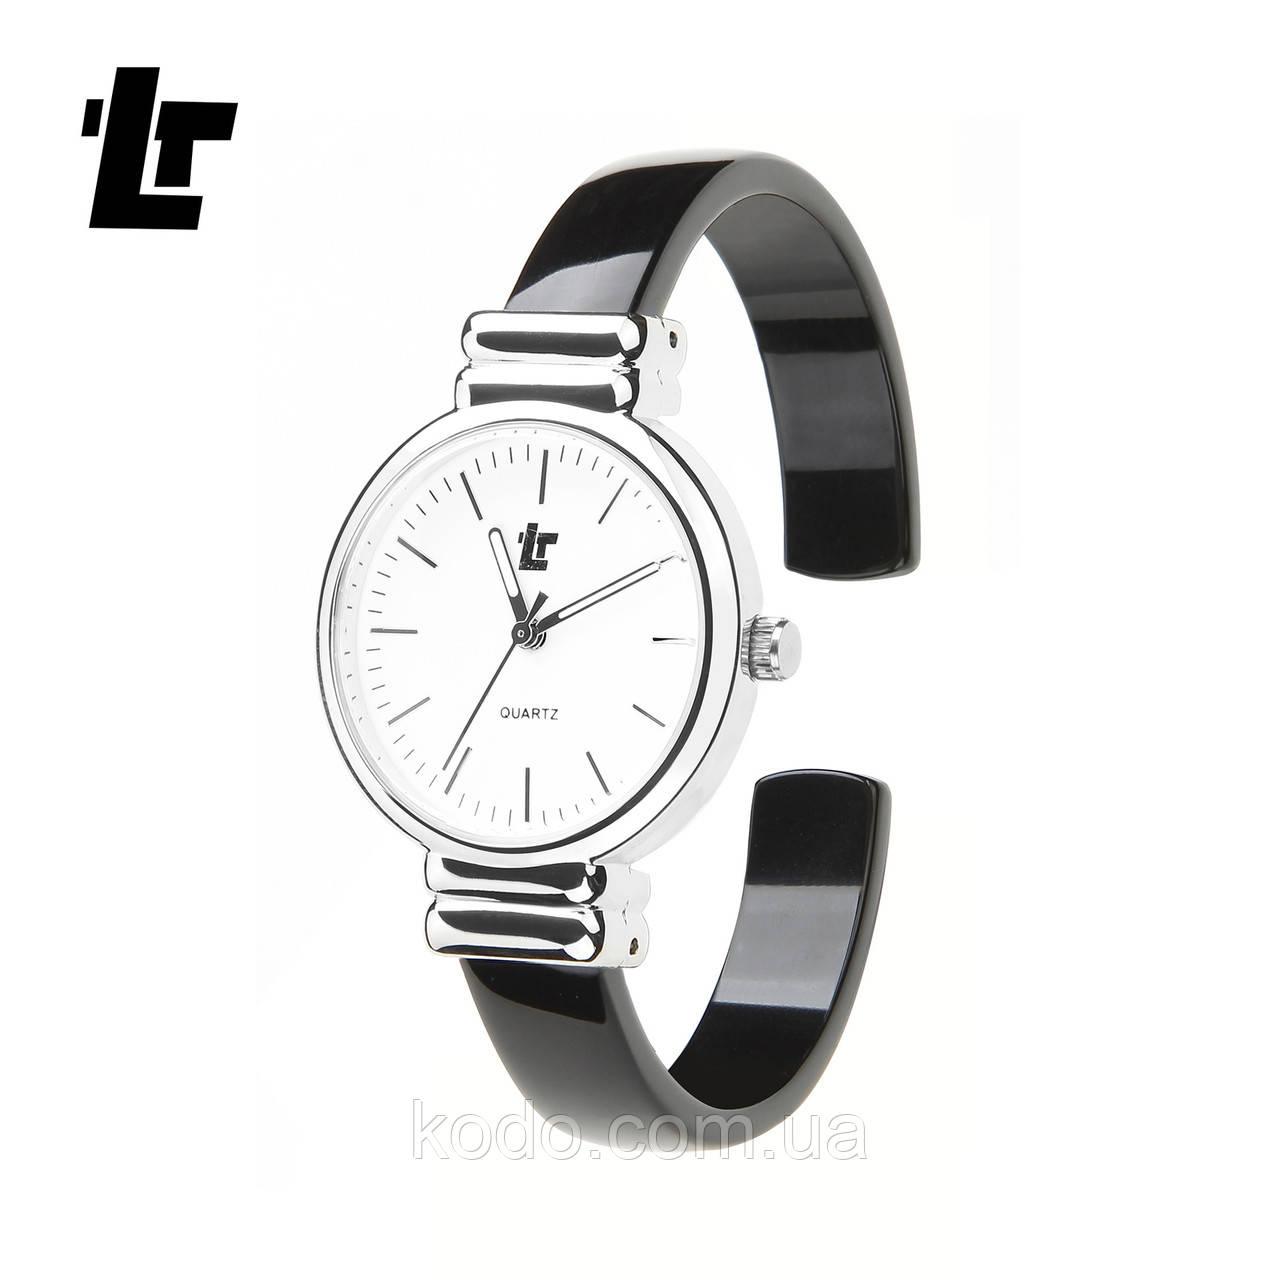 Tinlap Bracelet Black